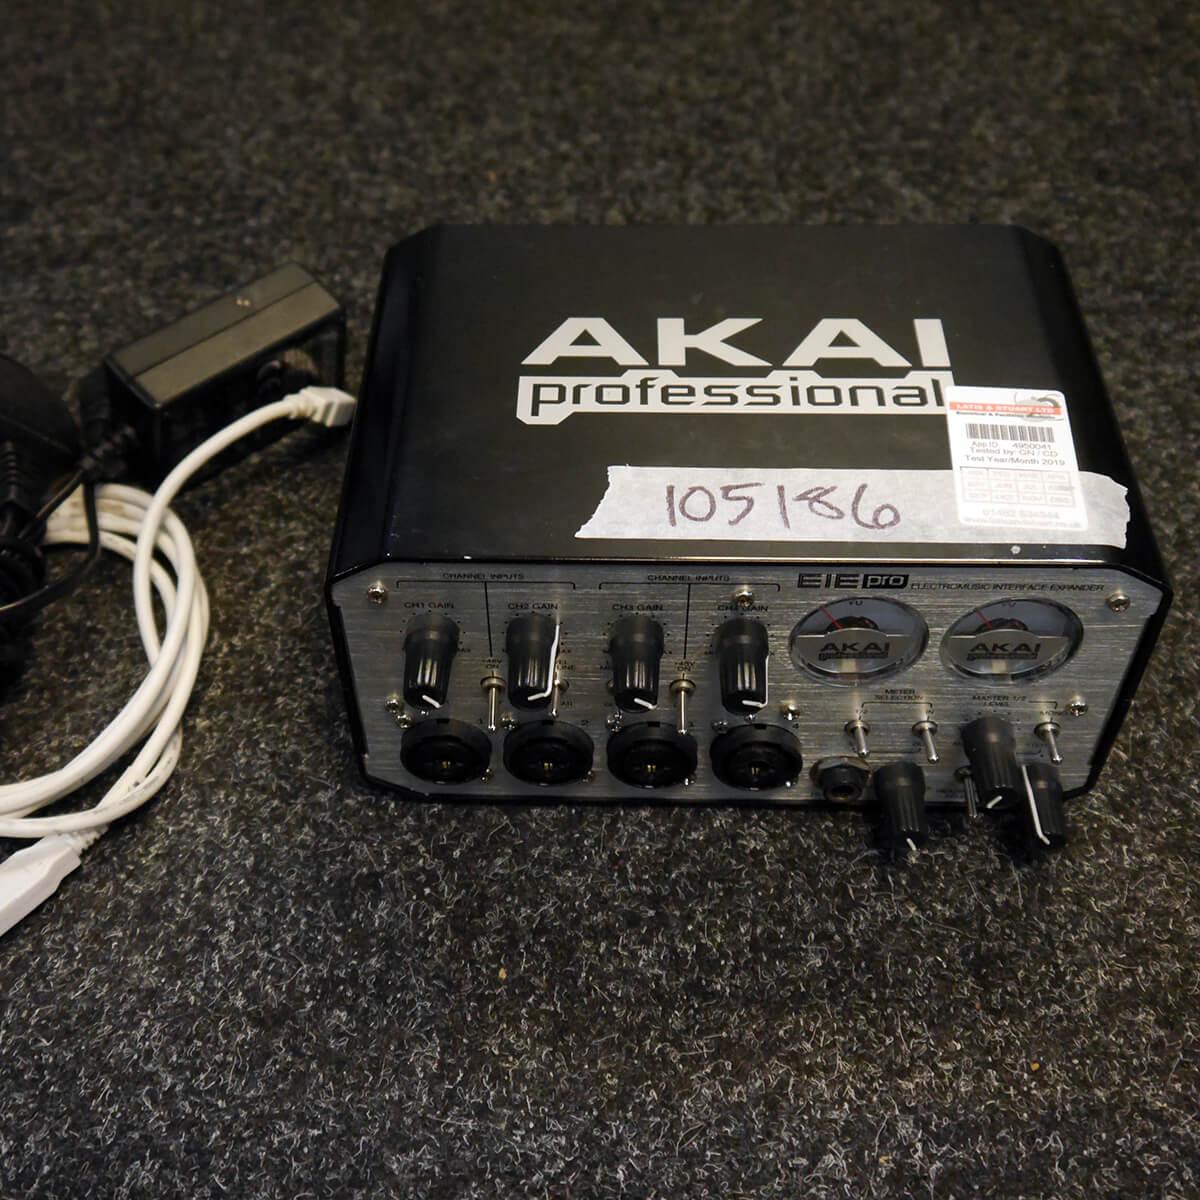 AKAI EIE Pro USB Audio Interface w/PSU & USB Cable - 2nd Hand